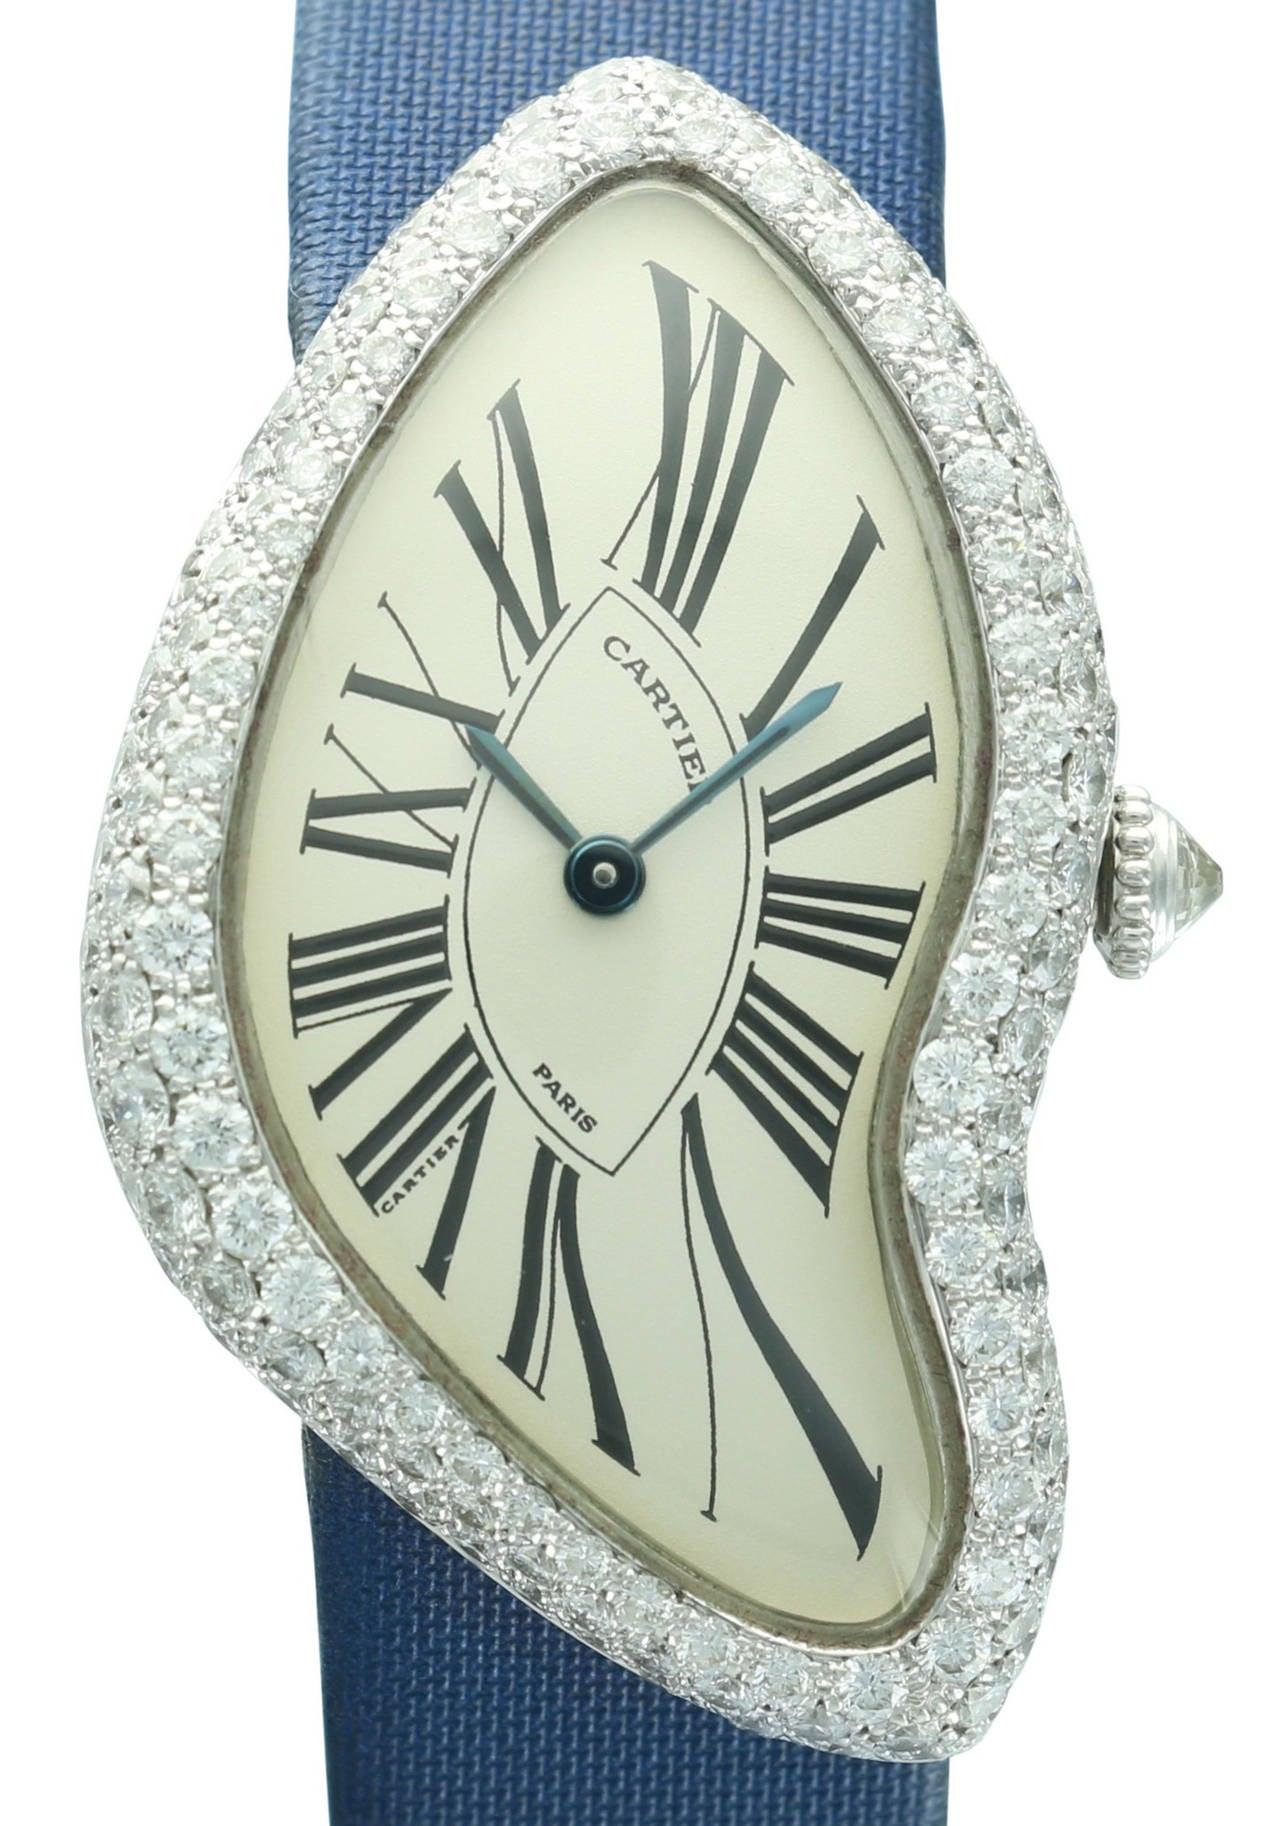 Cartier White Gold Crash Diamond Bezel Wristwatch 2